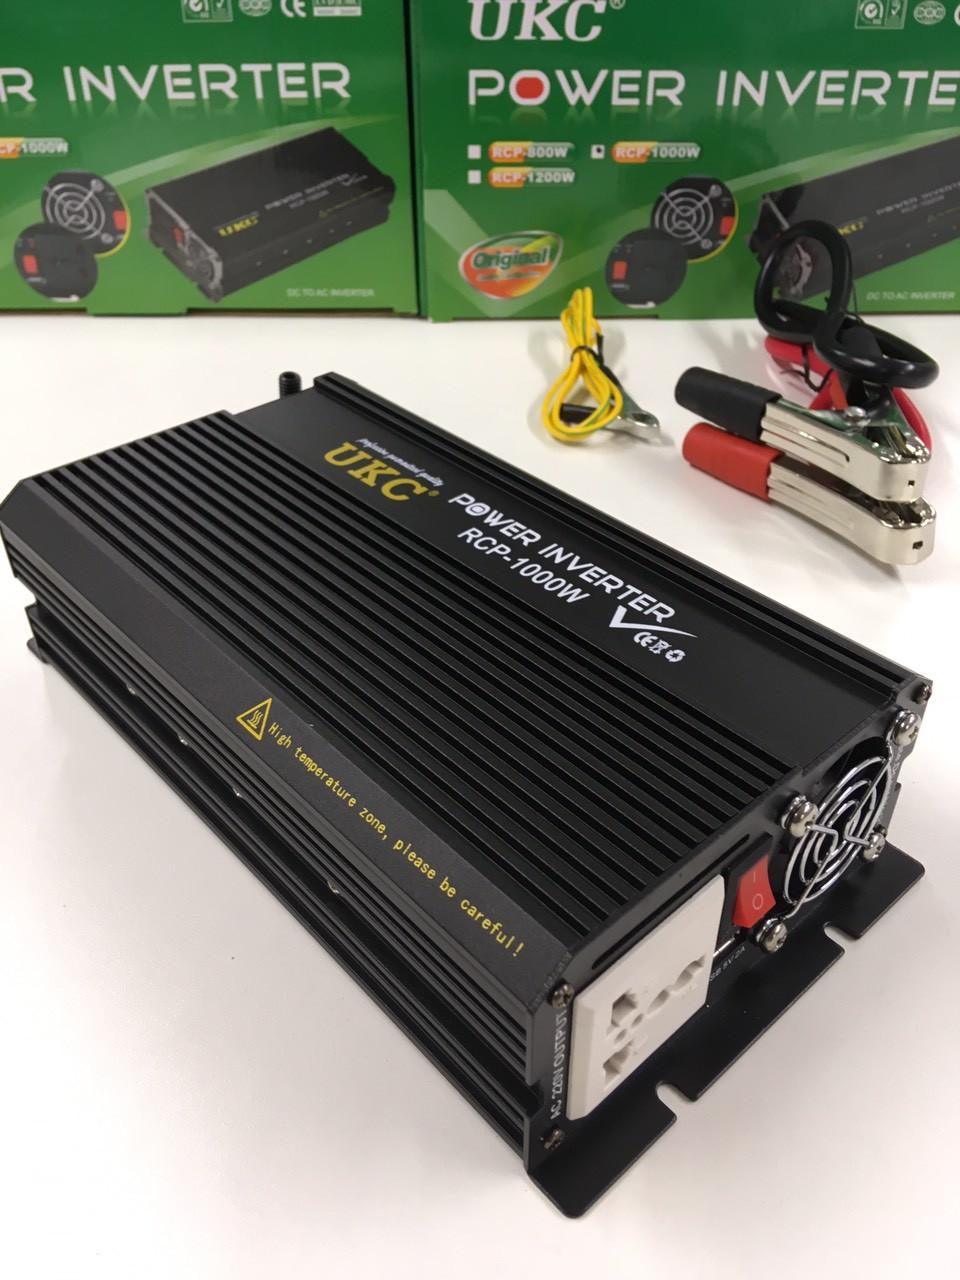 Преобразователь инвертор UKC Power Invertrer RCP-1000W 12v-220v